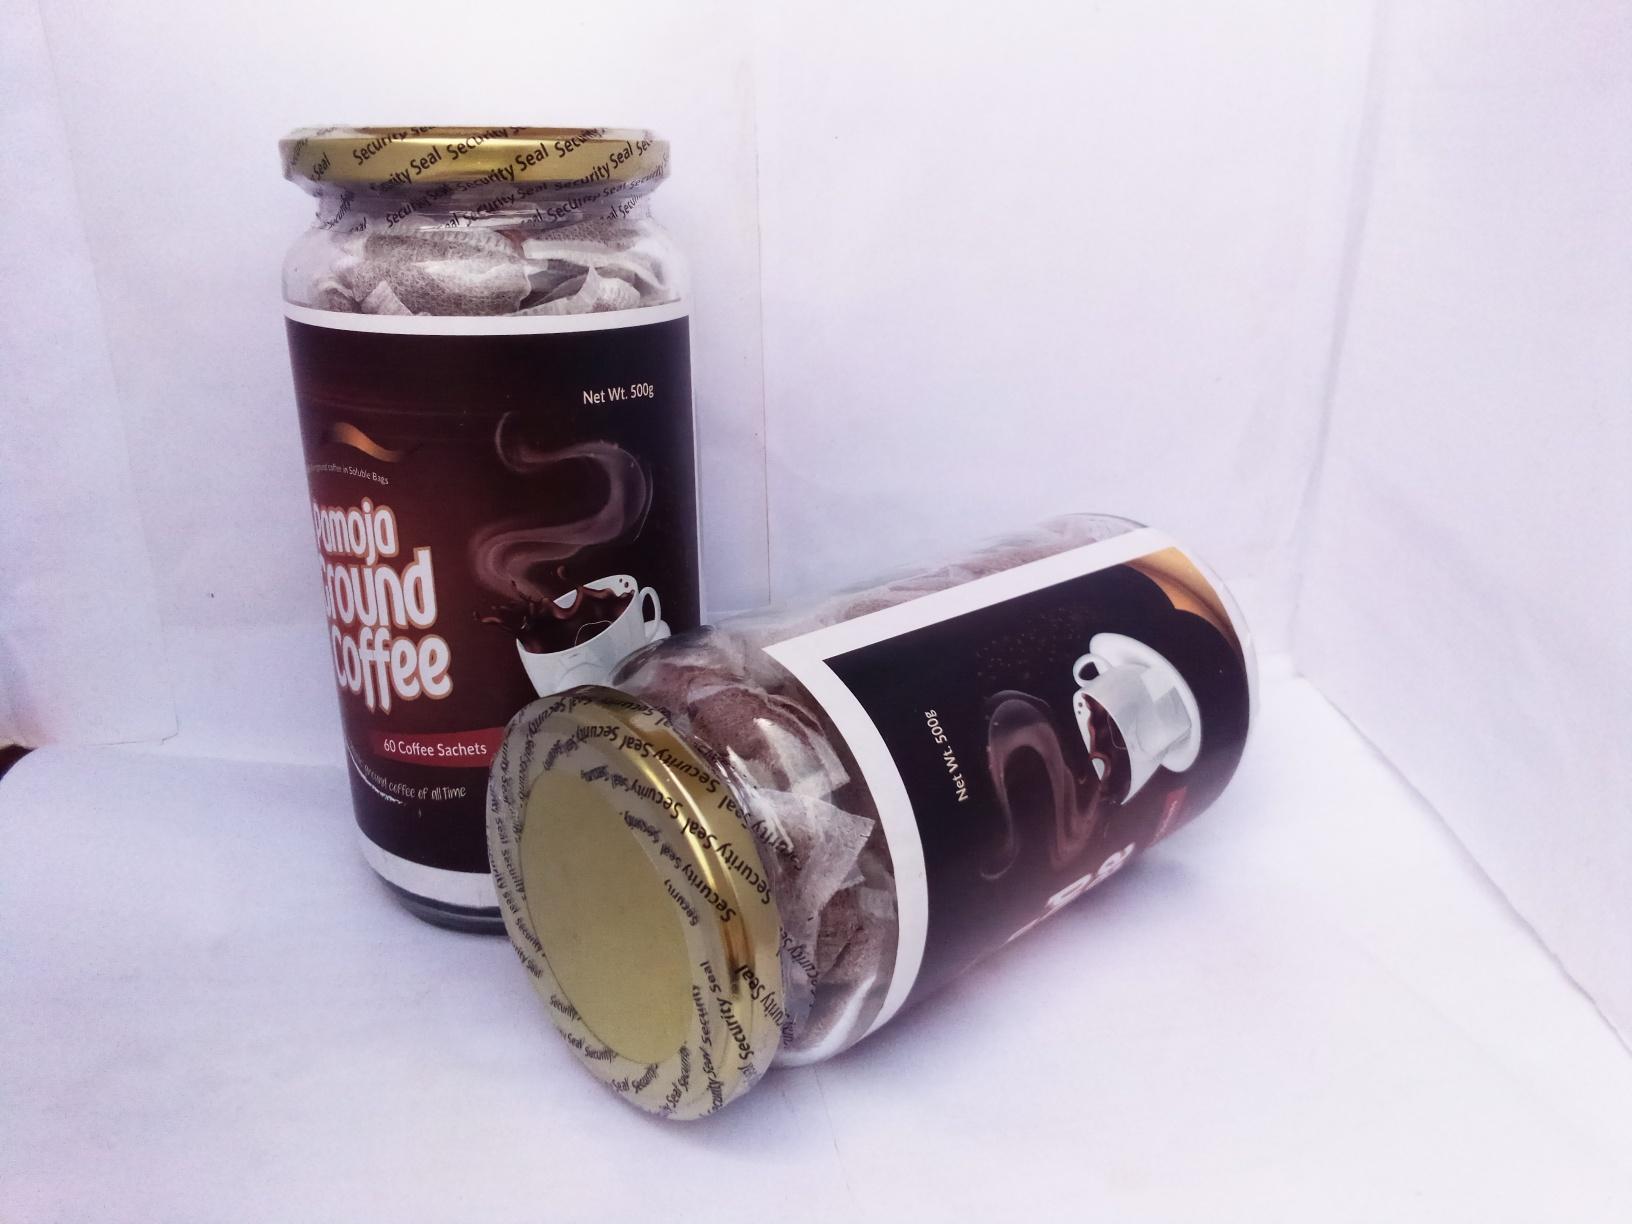 Pamoja Ground Coffee